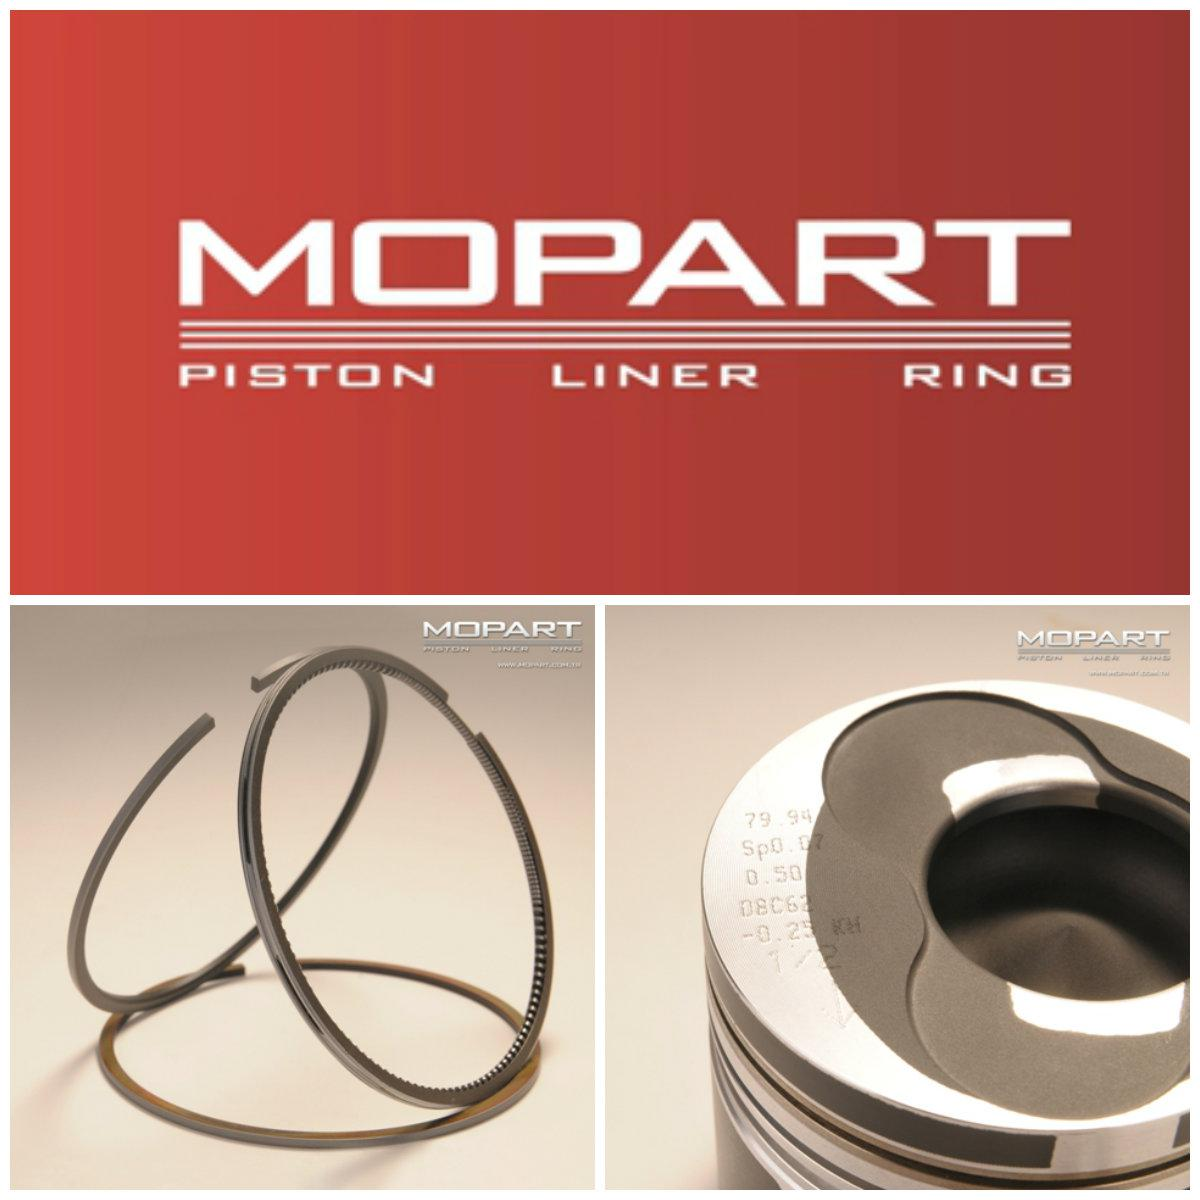 Кольца поршневые OPEL 75.0 (1.5/1.5/4) 13N/13S (Mopart) 02-4303-000